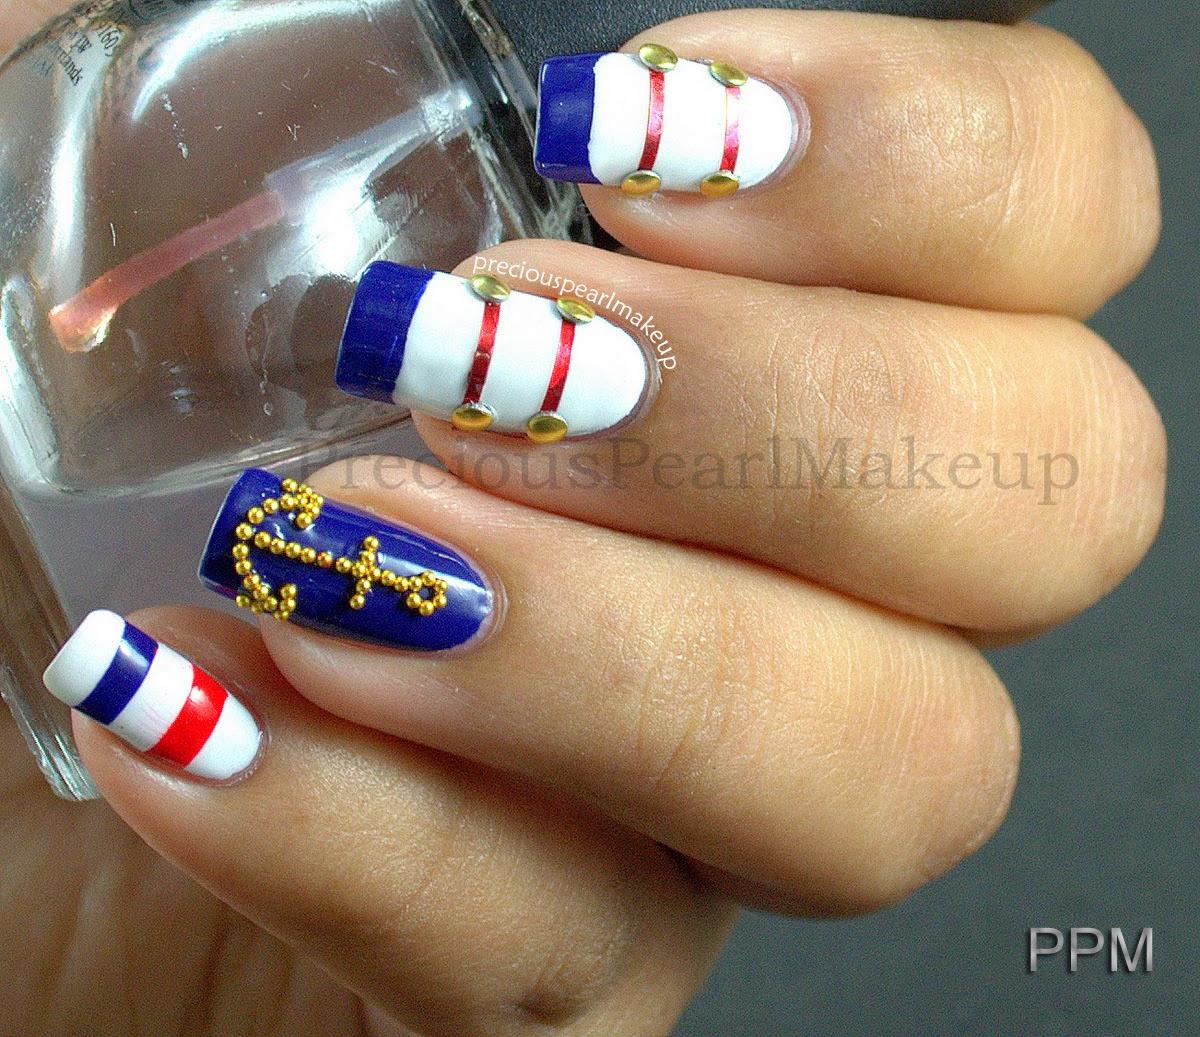 preciouspearlmakeup: Get Nautical!